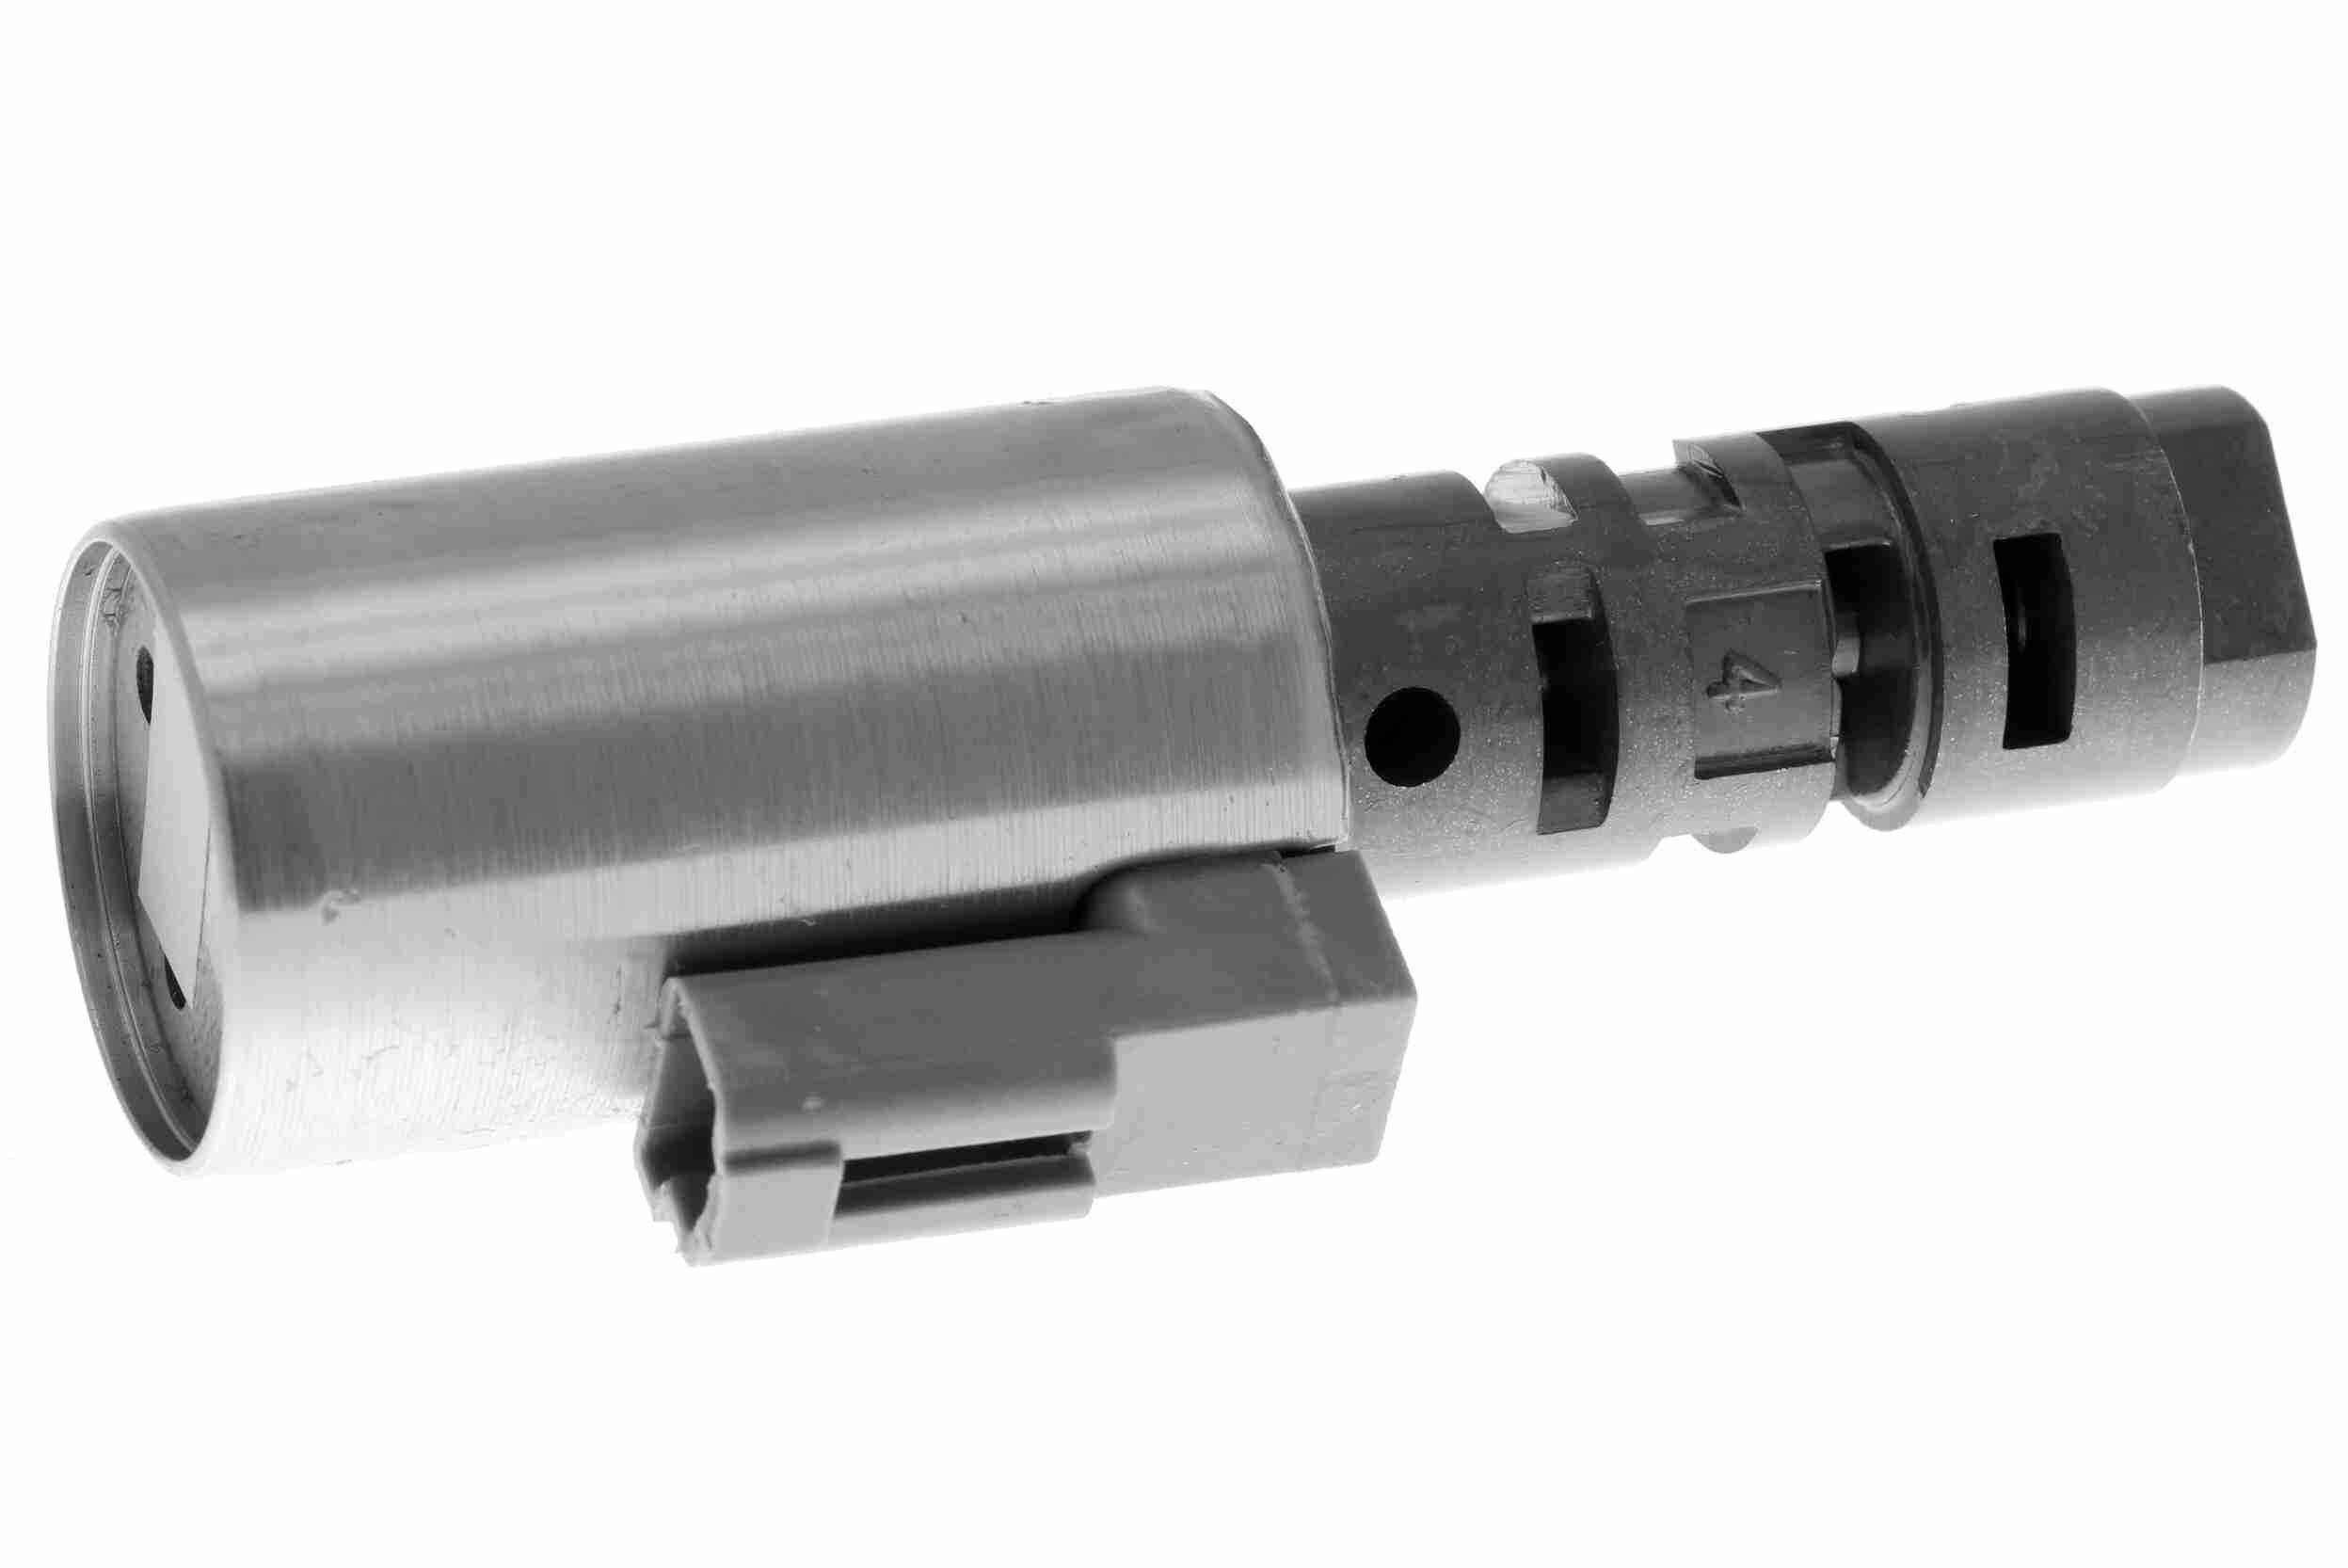 LANCIA GAMMA Schaltventil, Automatikgetriebe - Original ACKOJA A70-77-2000